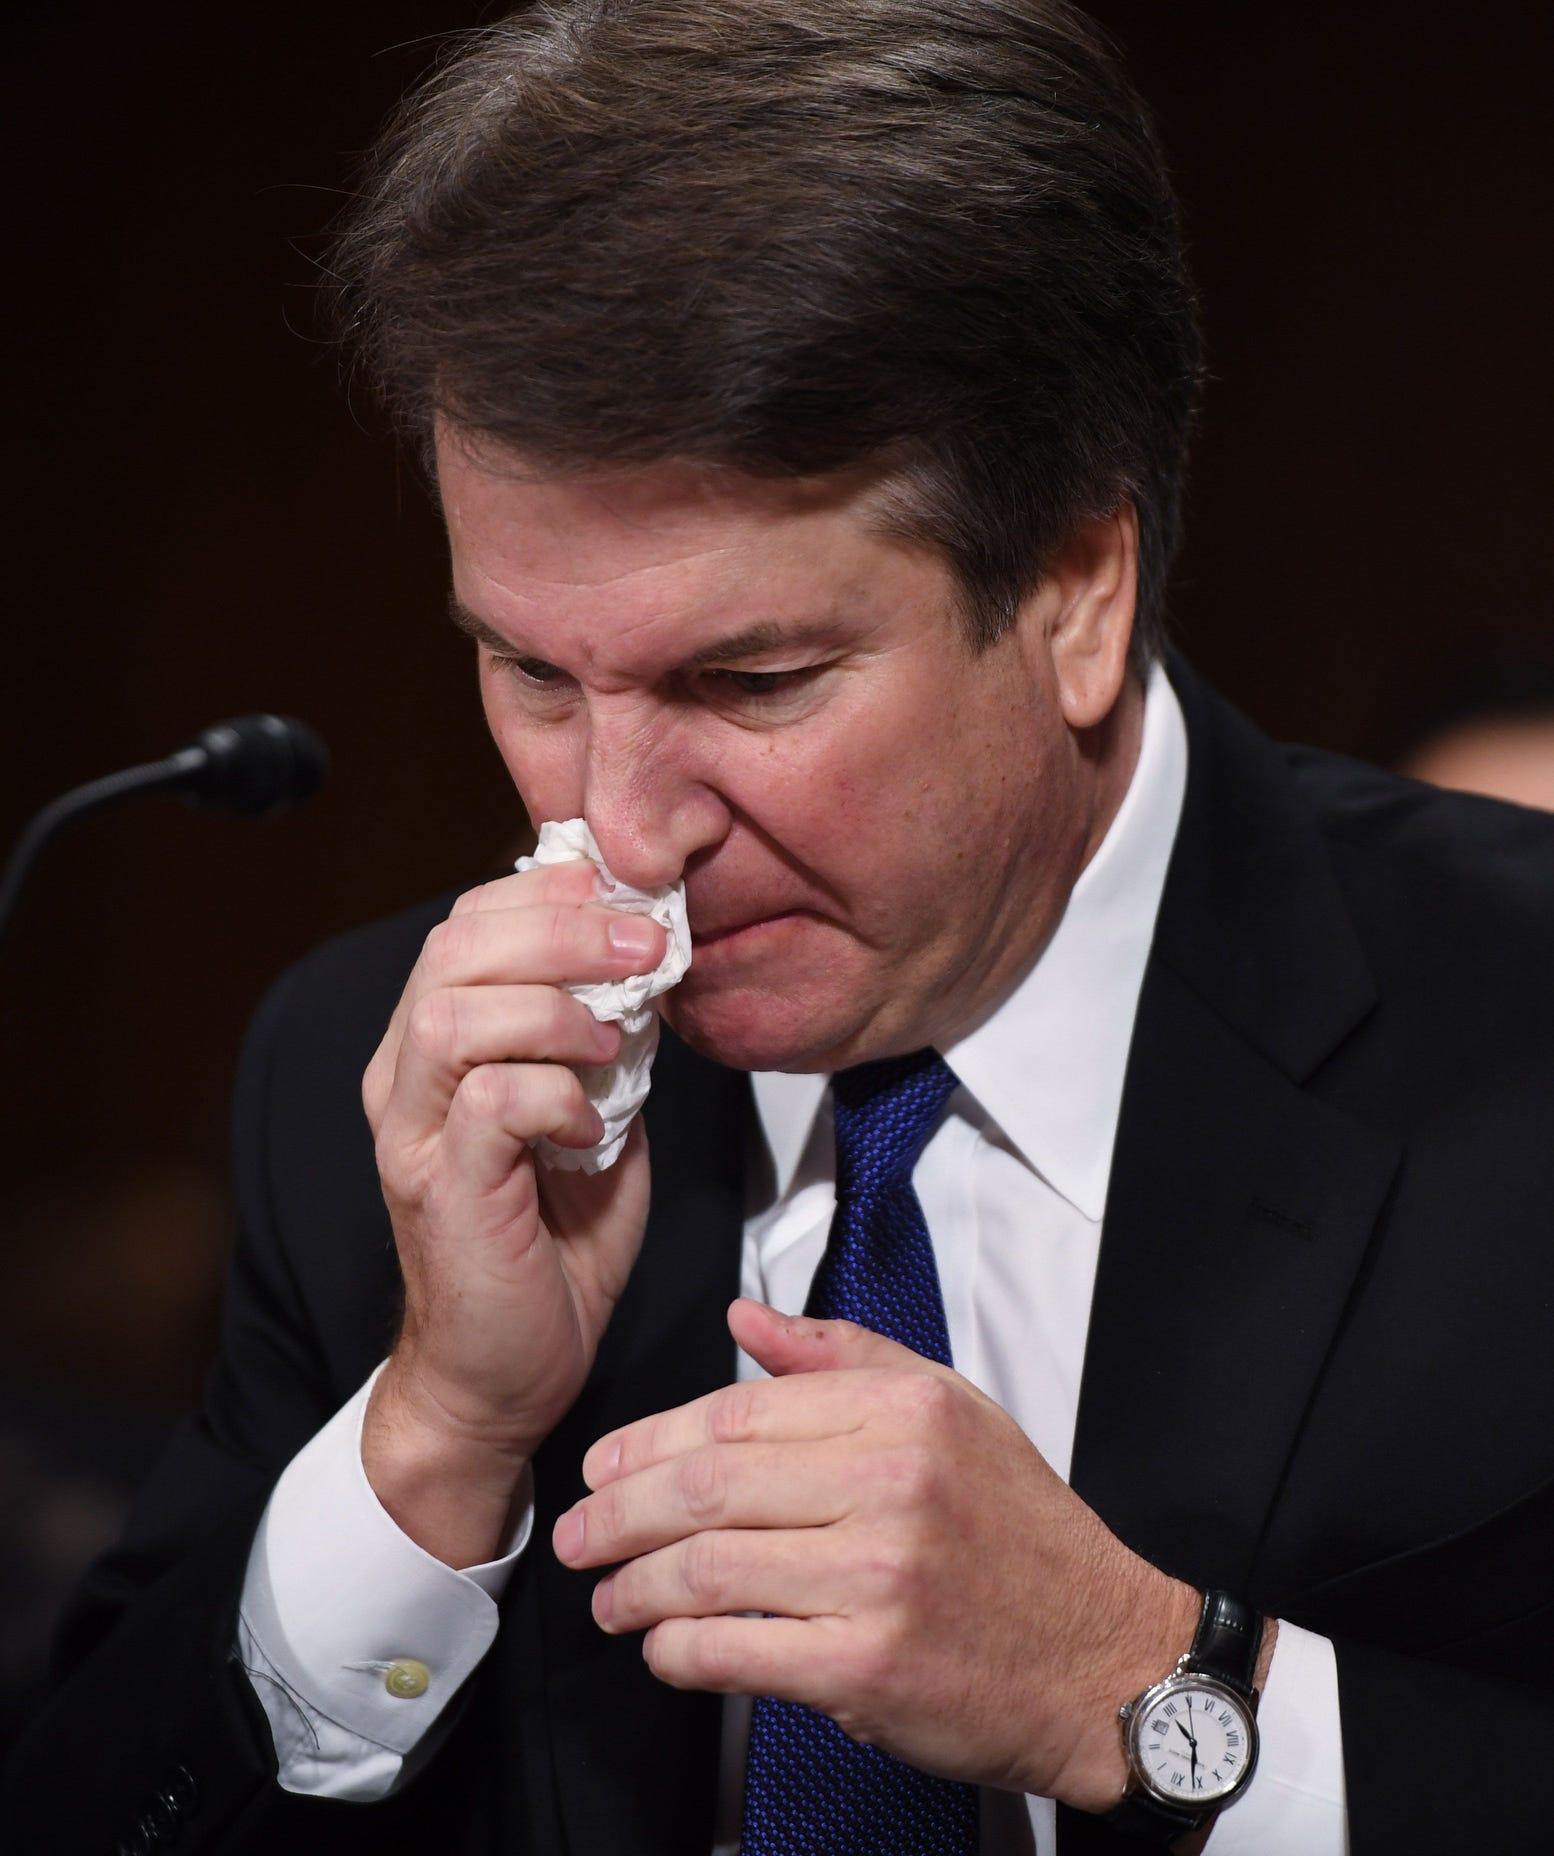 Supreme Court nominee Judge Brett Kavanaugh is visibly upset as he testifies before the US Senate Judiciary Committee.